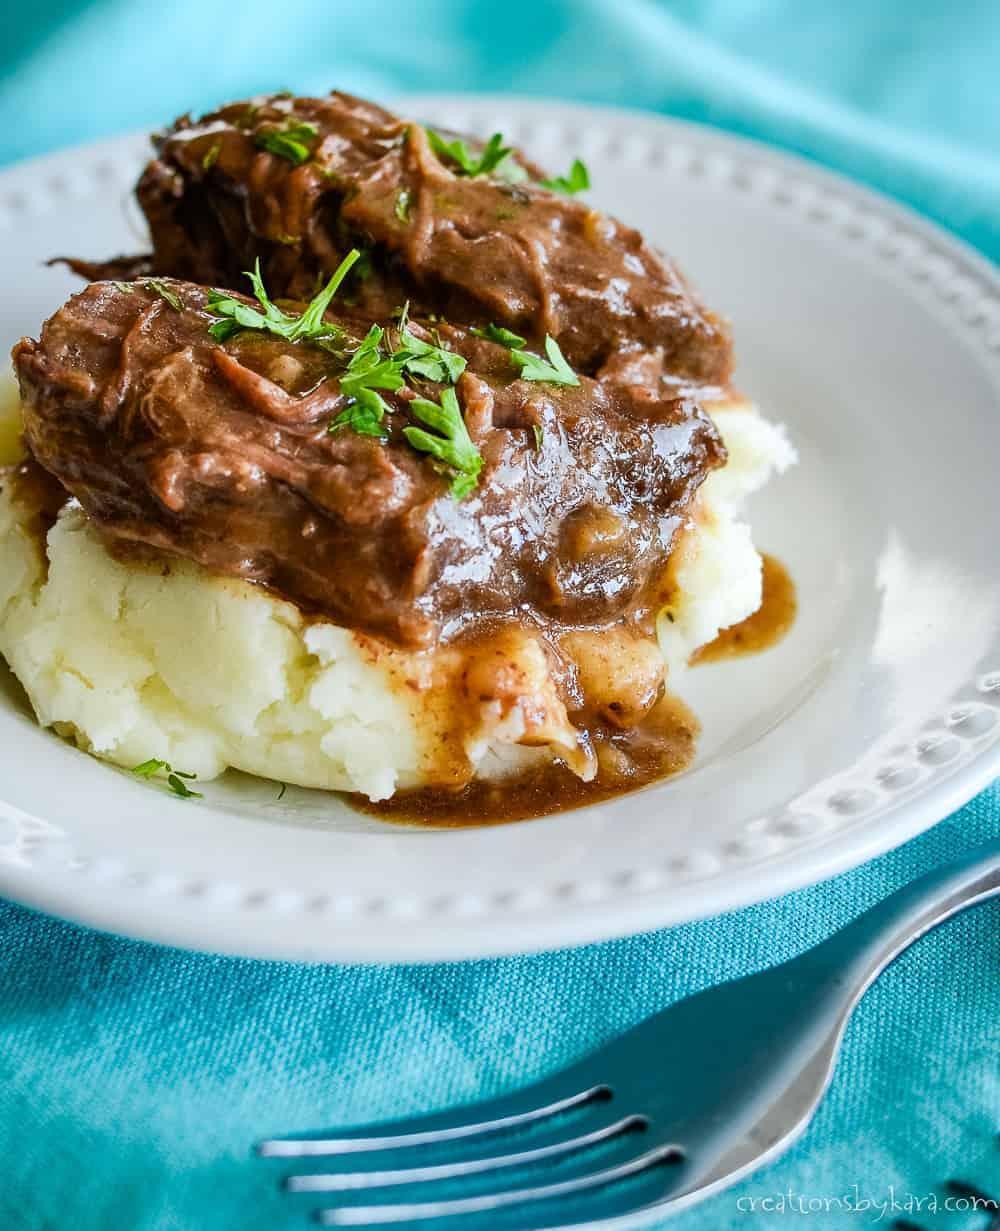 Best Ever Crock Pot Roast Beef Makes It S Own Gravy Creations By Kara